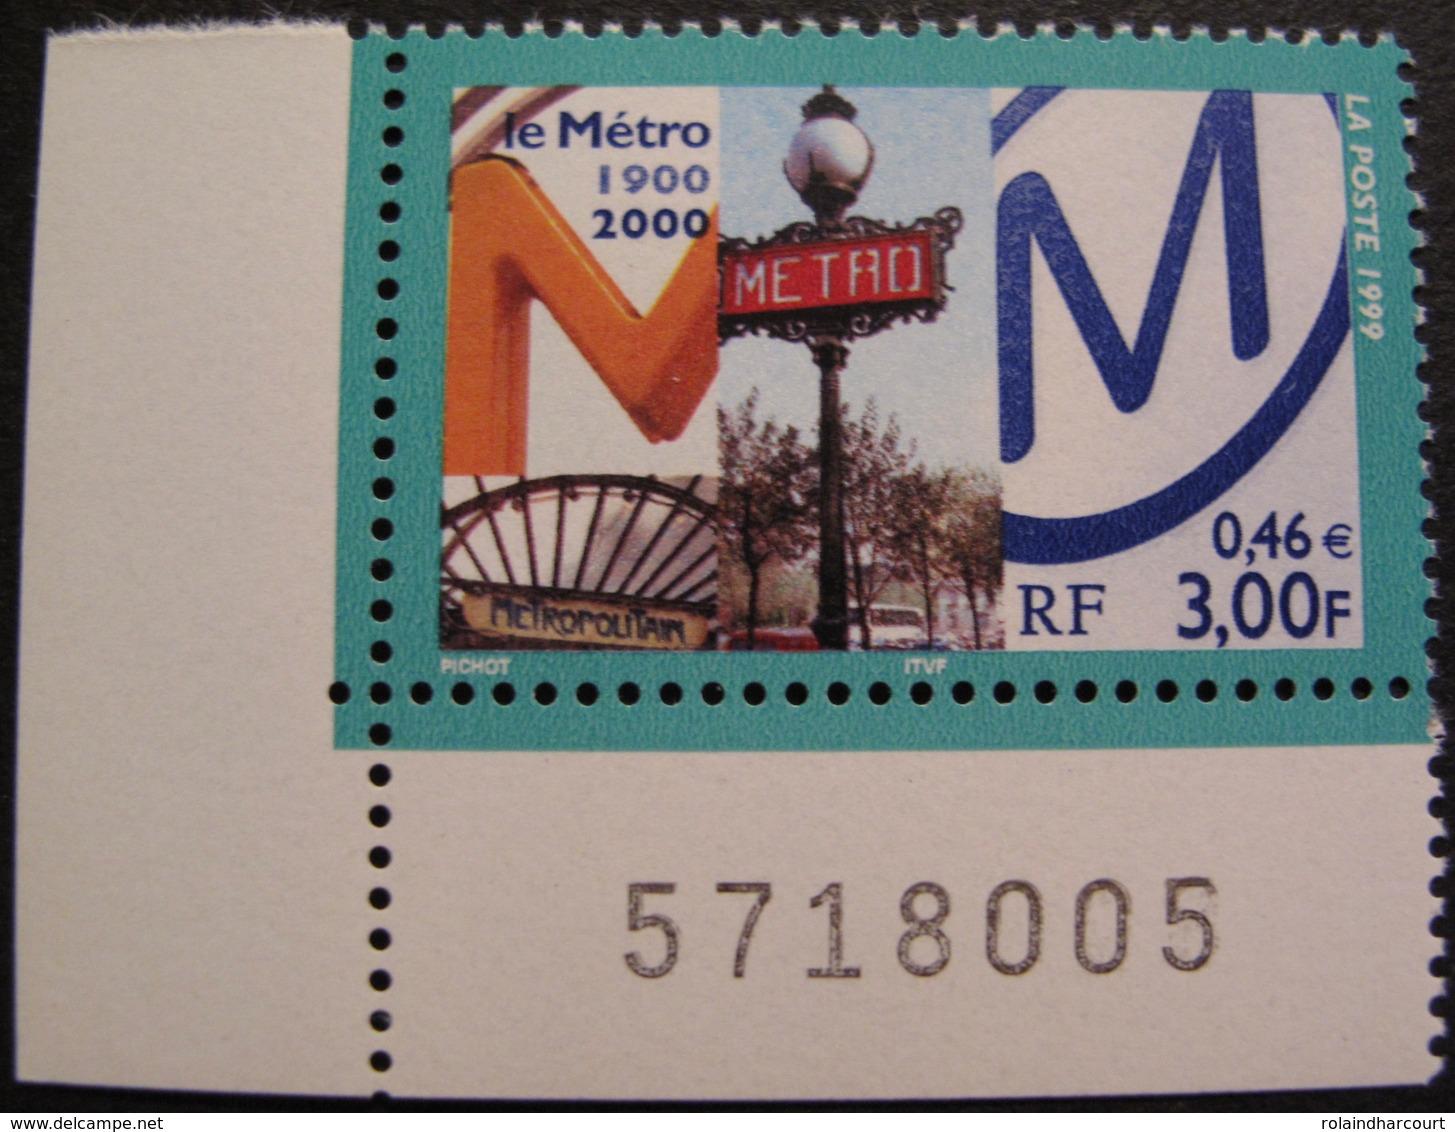 Lot 1894 - 1999 - LE METRO 1900-2000 - N°3292 NEUF** COIN DE FEUILLE - France